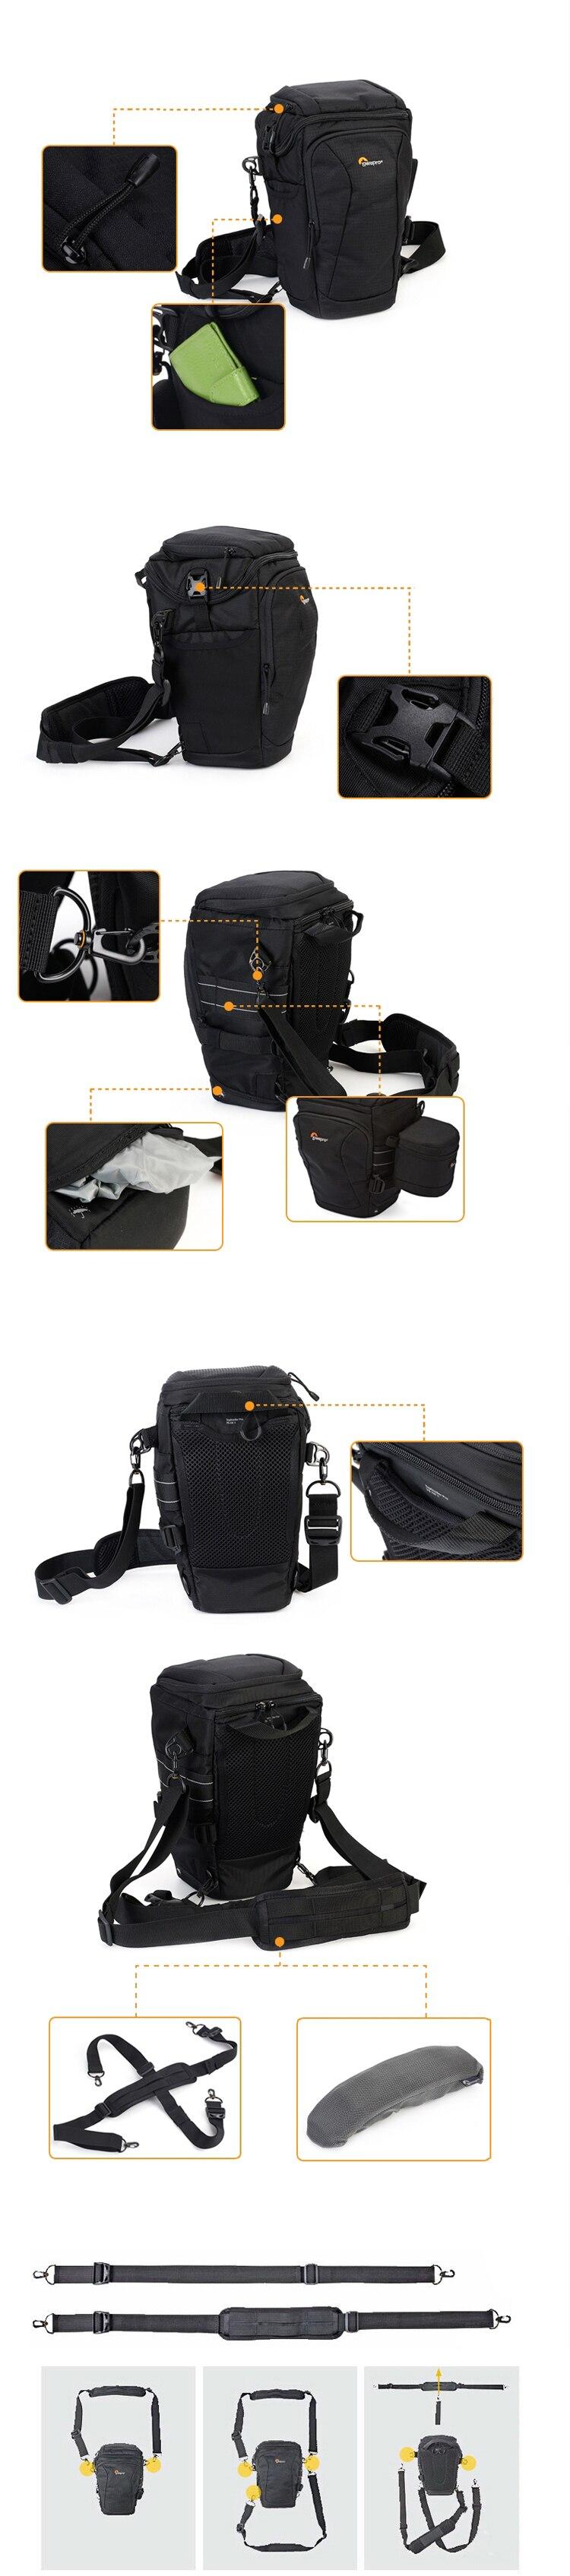 Lowepro Toploader Pro 75 Aw Ii Digital Slr Camera Triangle Shoulder Zoom 45 Black Internal Dimensions295cm178cm16cm Weight105kg